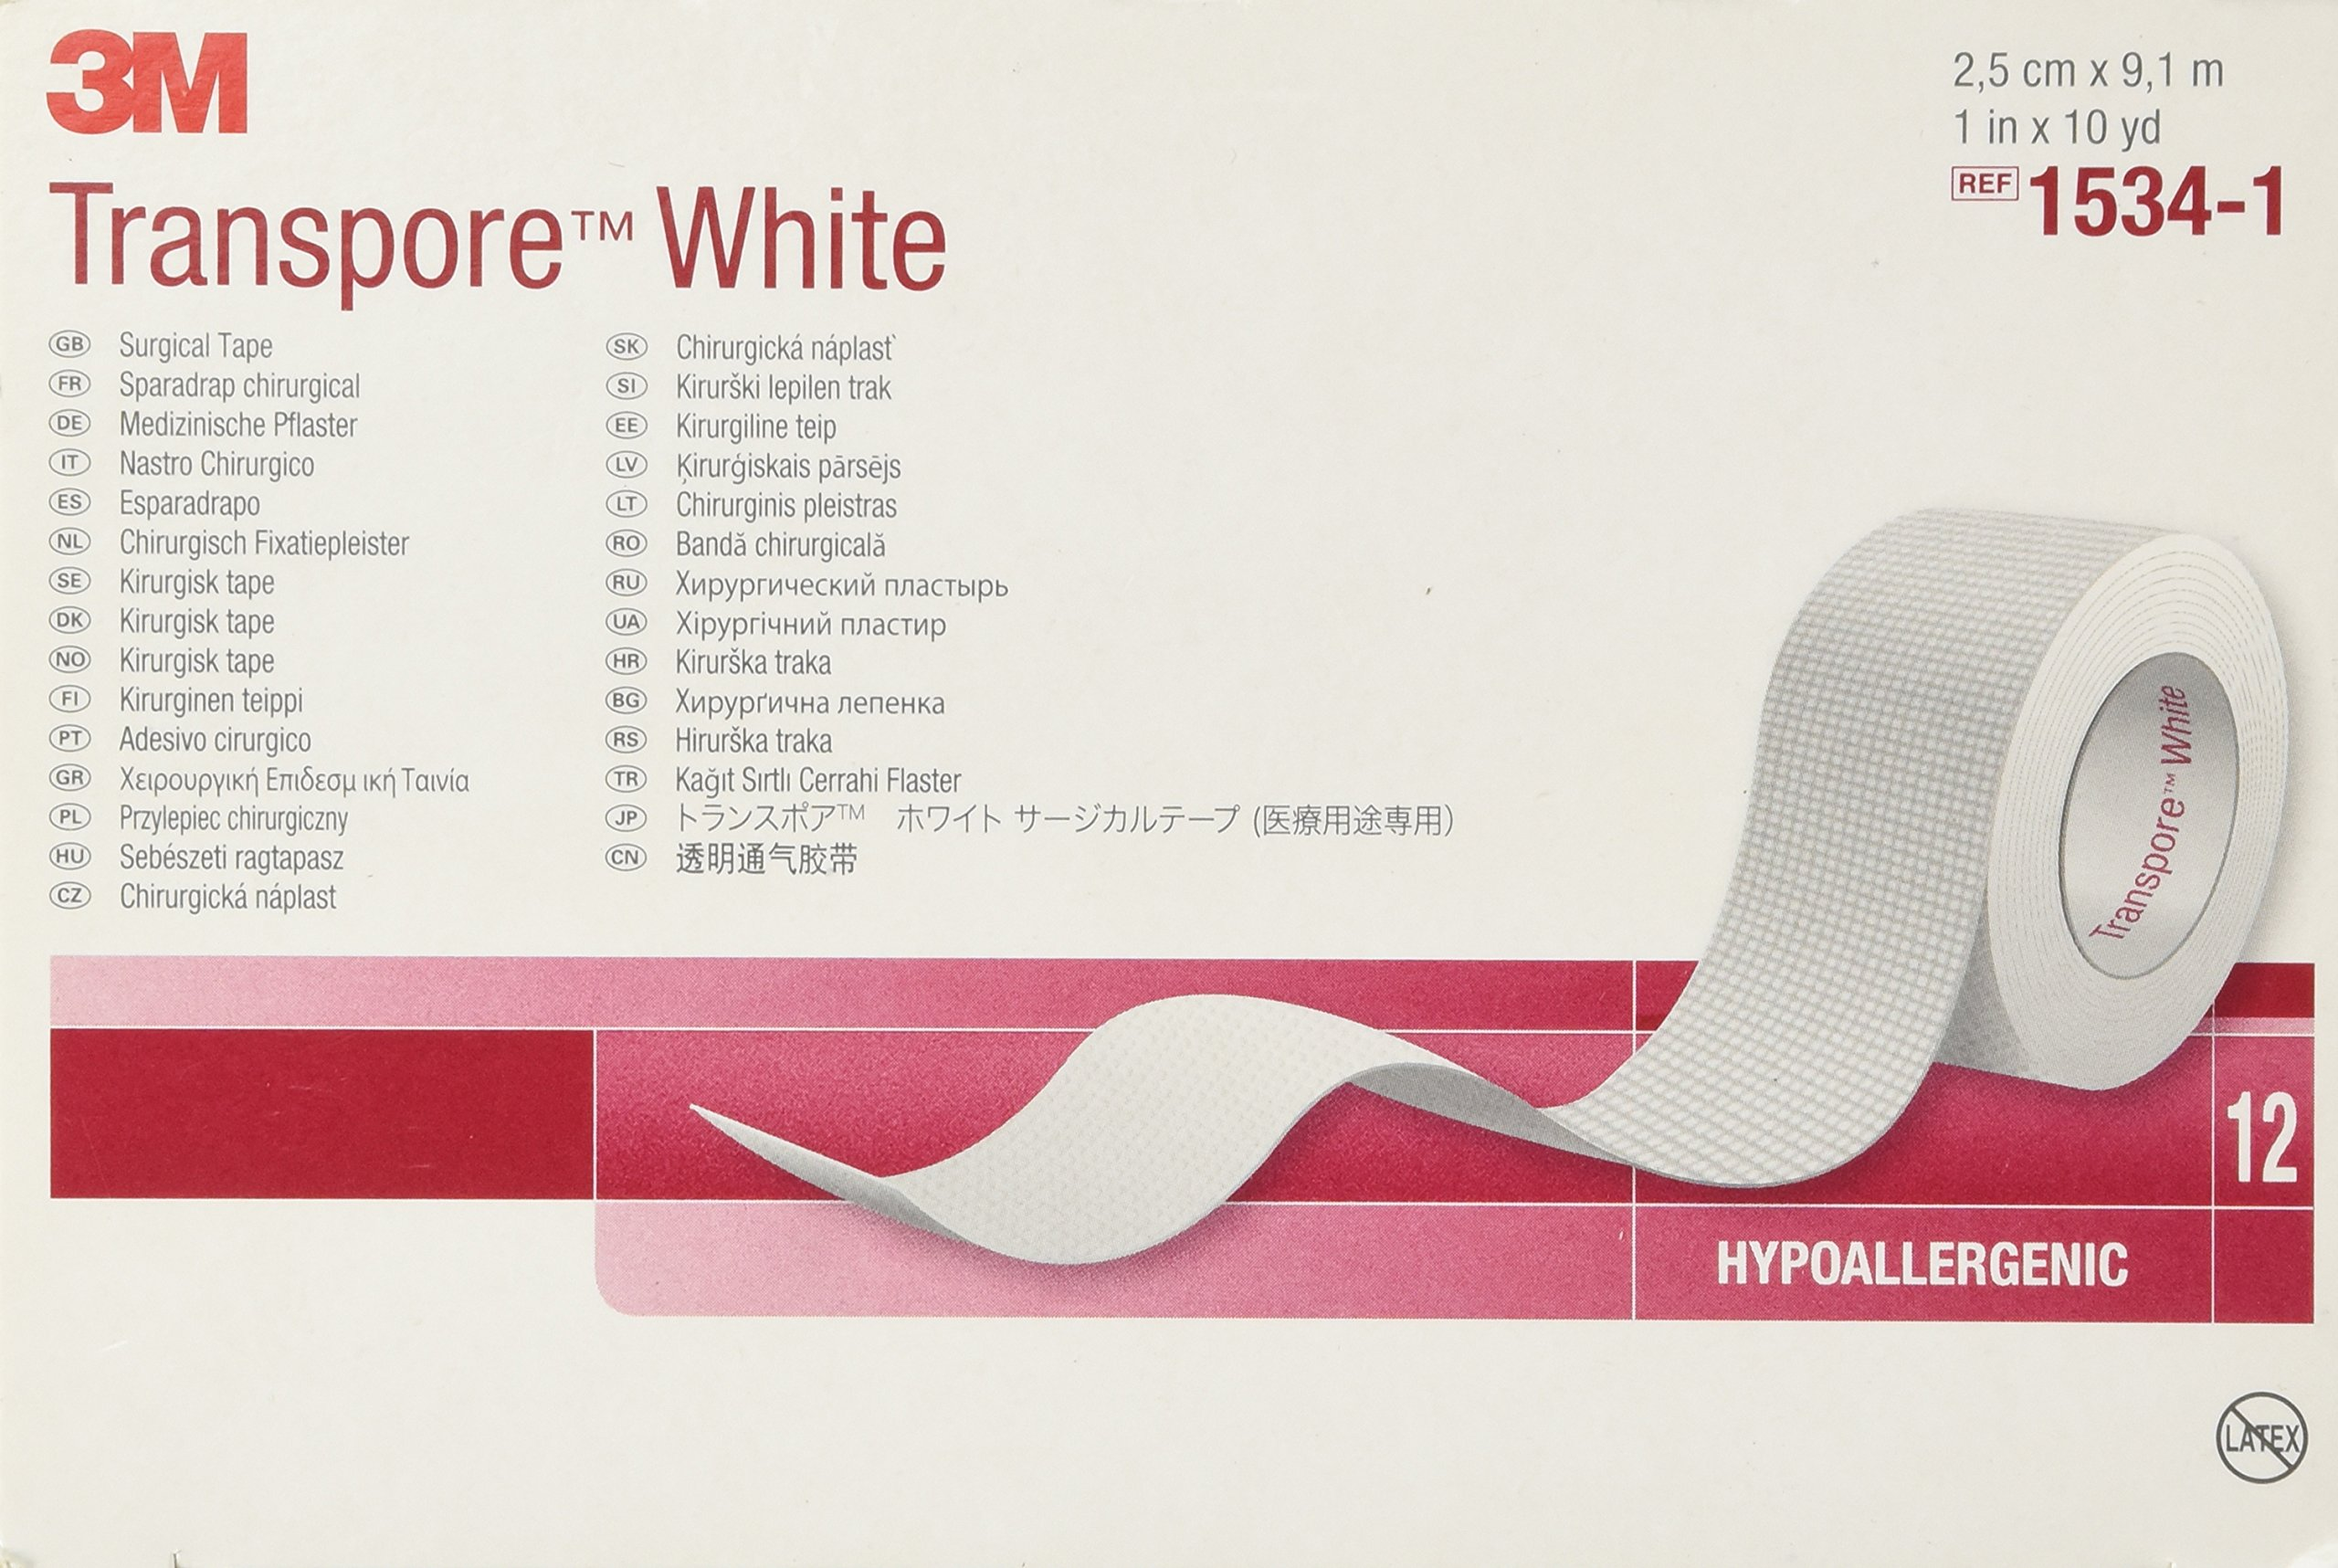 3M 1534-1 Transpore White Tape, 12 Rolls